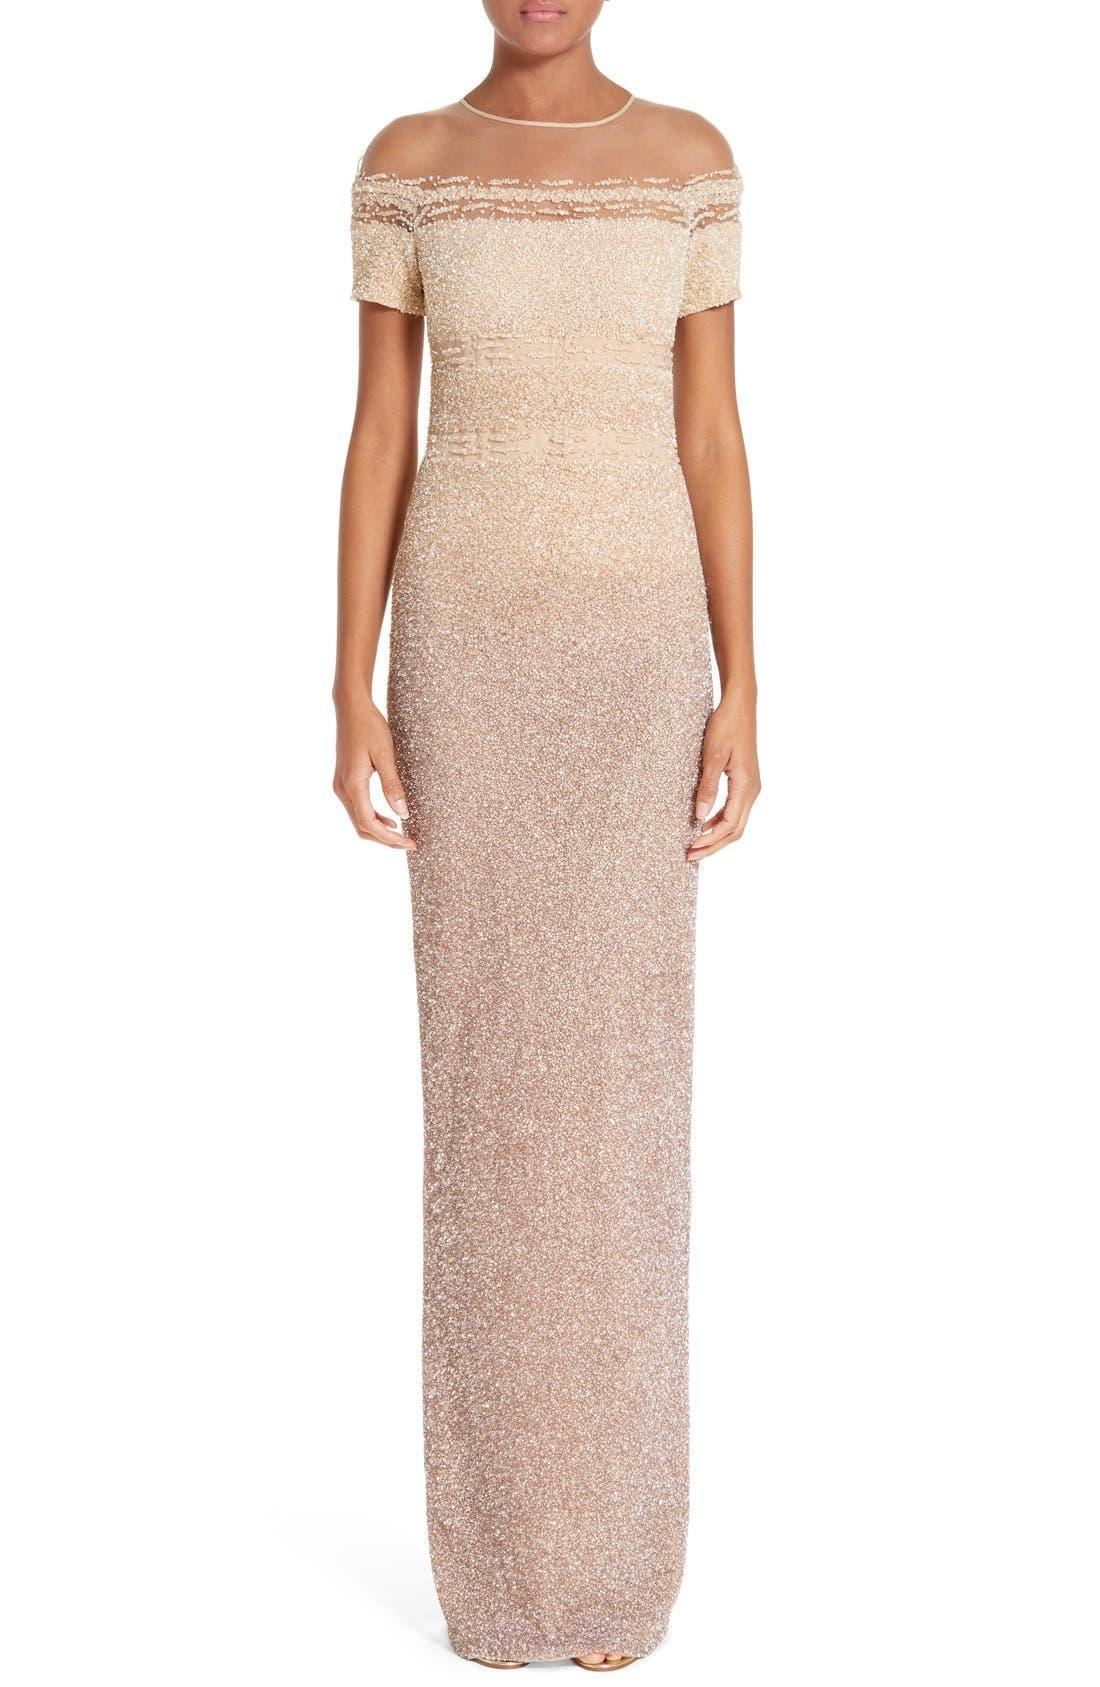 Alternate Image 1 Selected - Pamella Roland Signature Sequin Column Gown